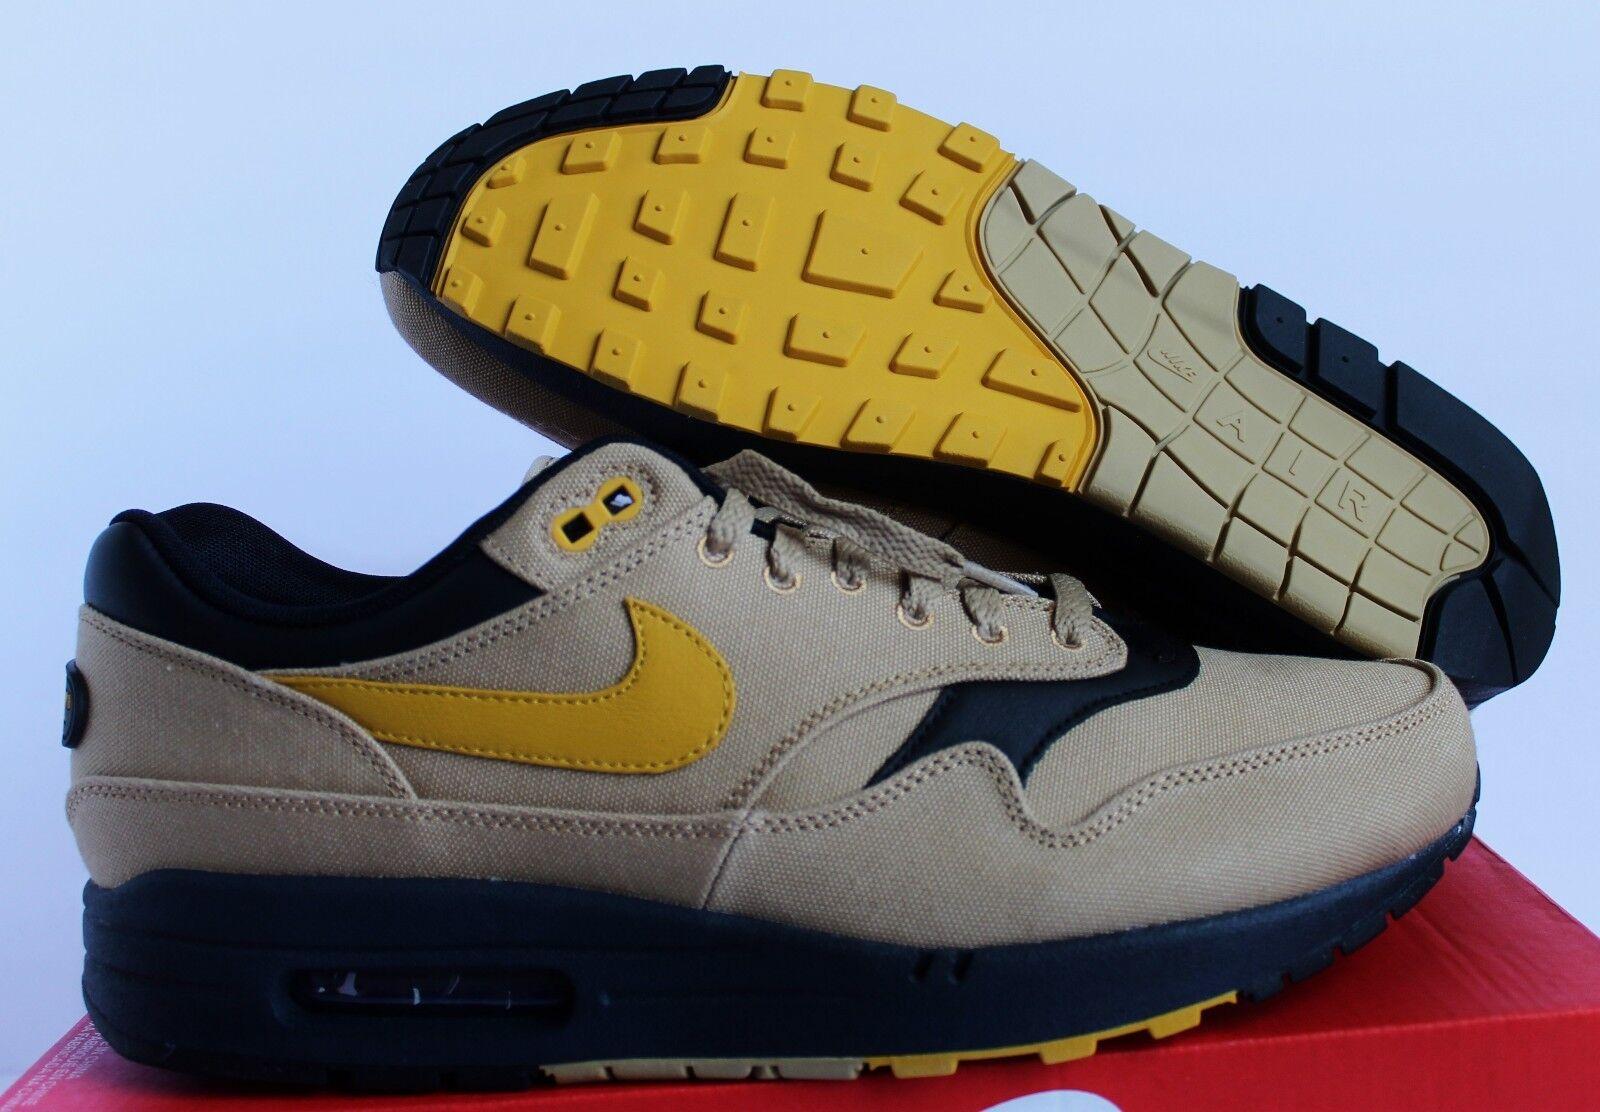 Nike Air Max 1 1 1 Premium gold-Mineral Yellow-Black Men's SZ 11.5 [875844-700] 1aab6a